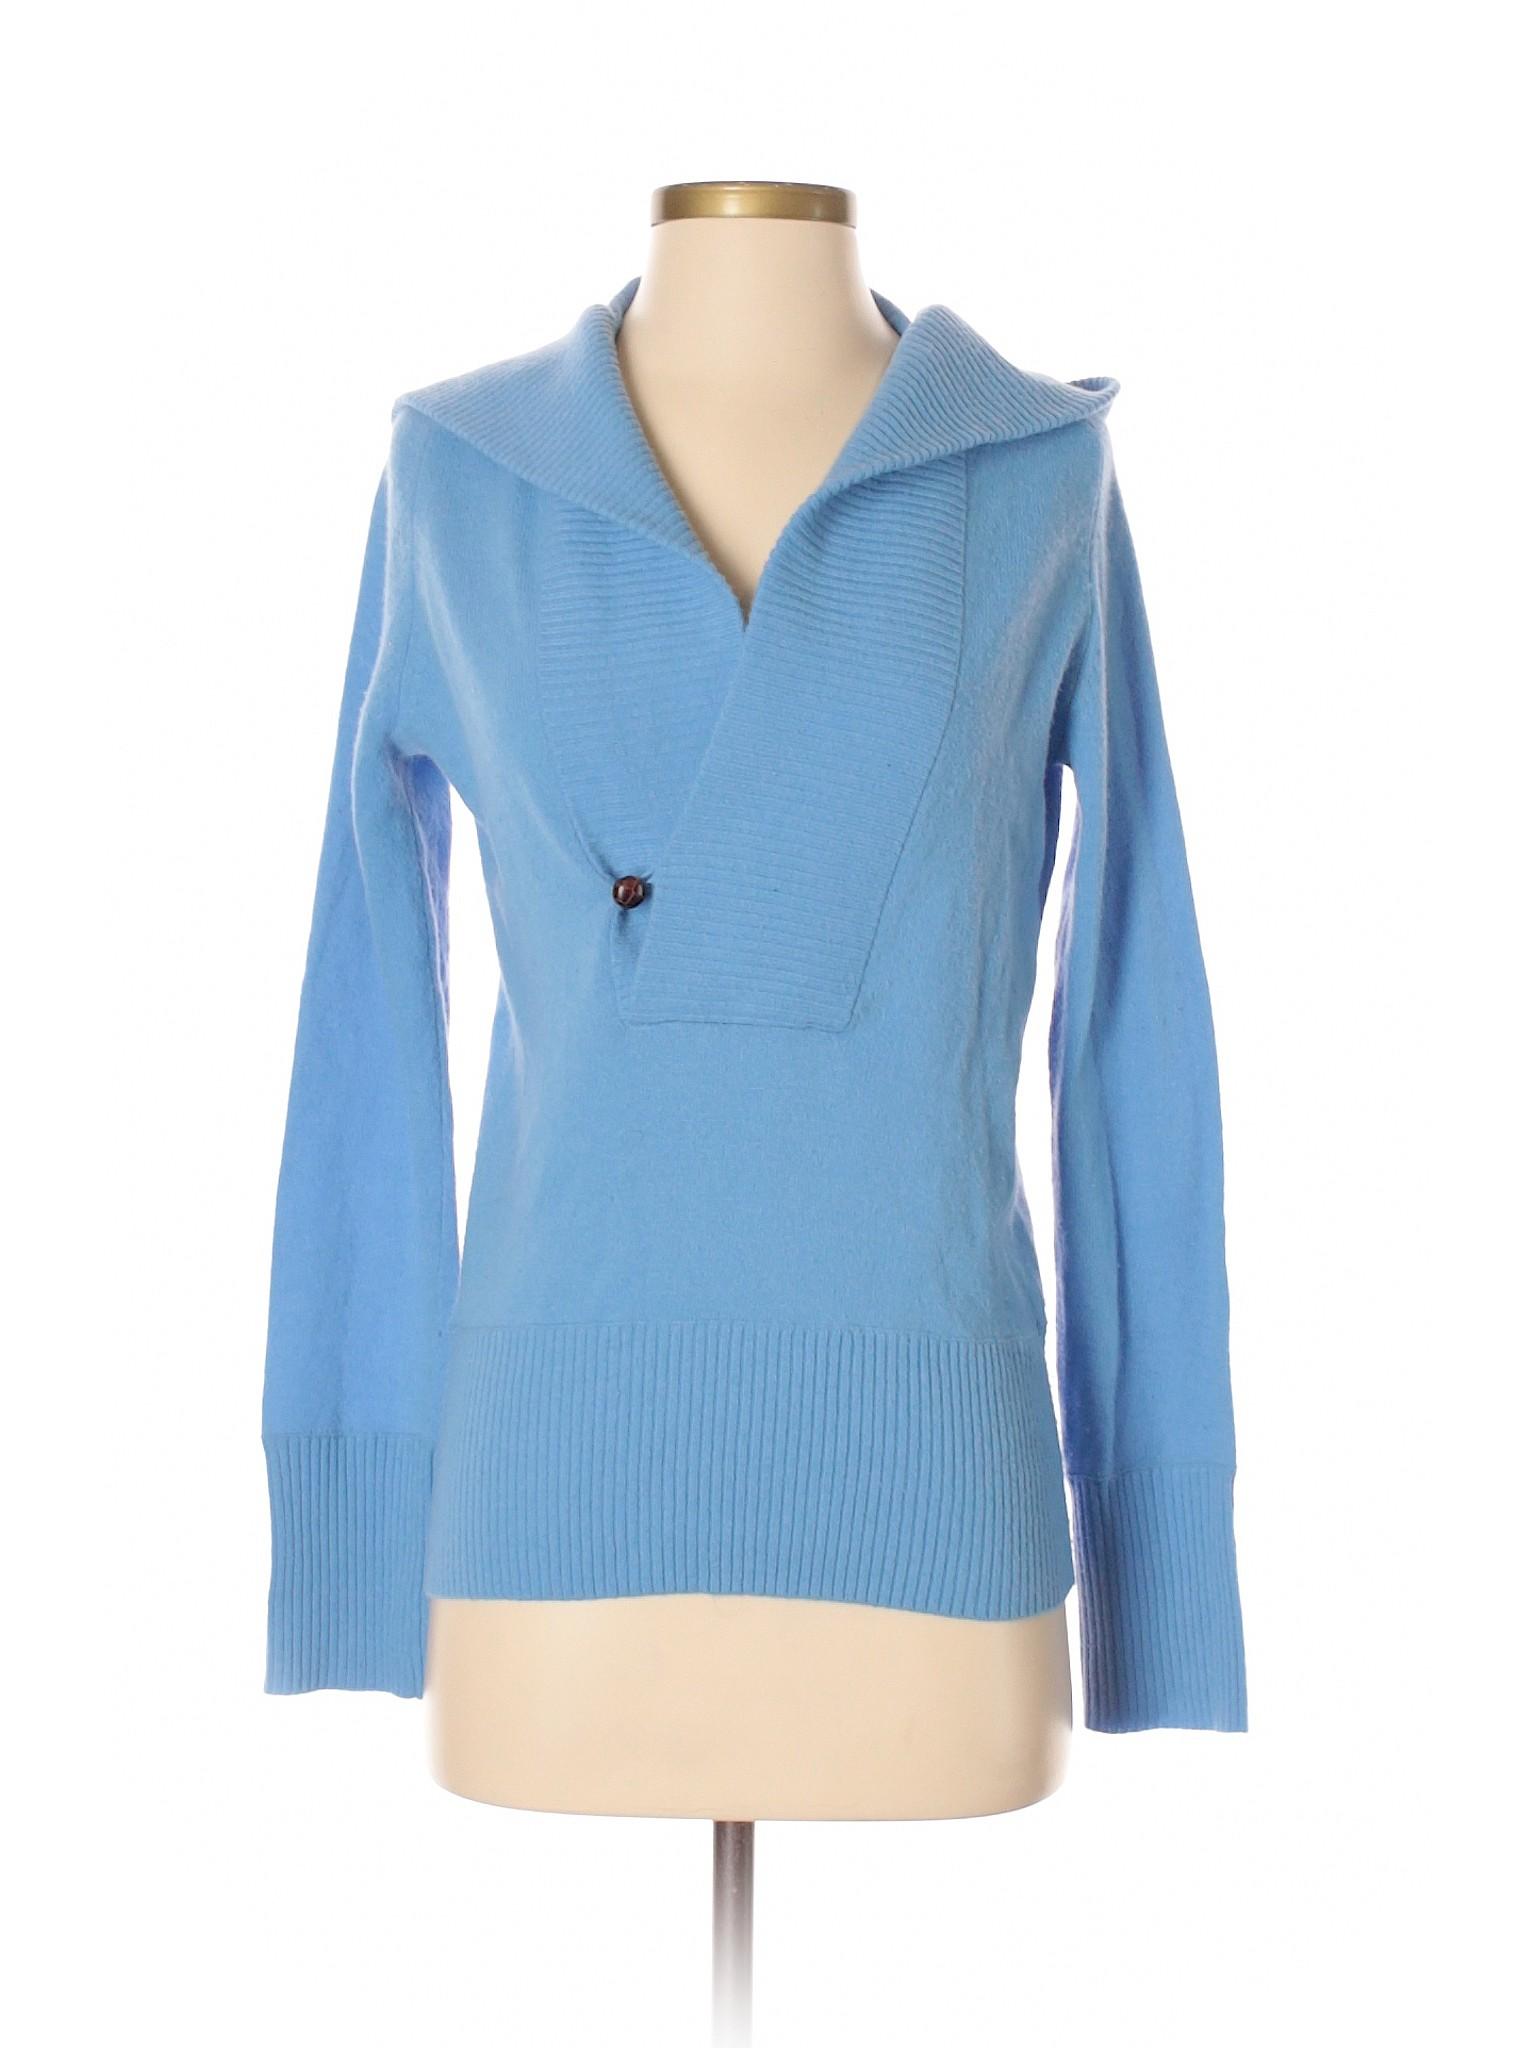 Sweater Pullover winter Wool Crew Boutique J dwXqIIf